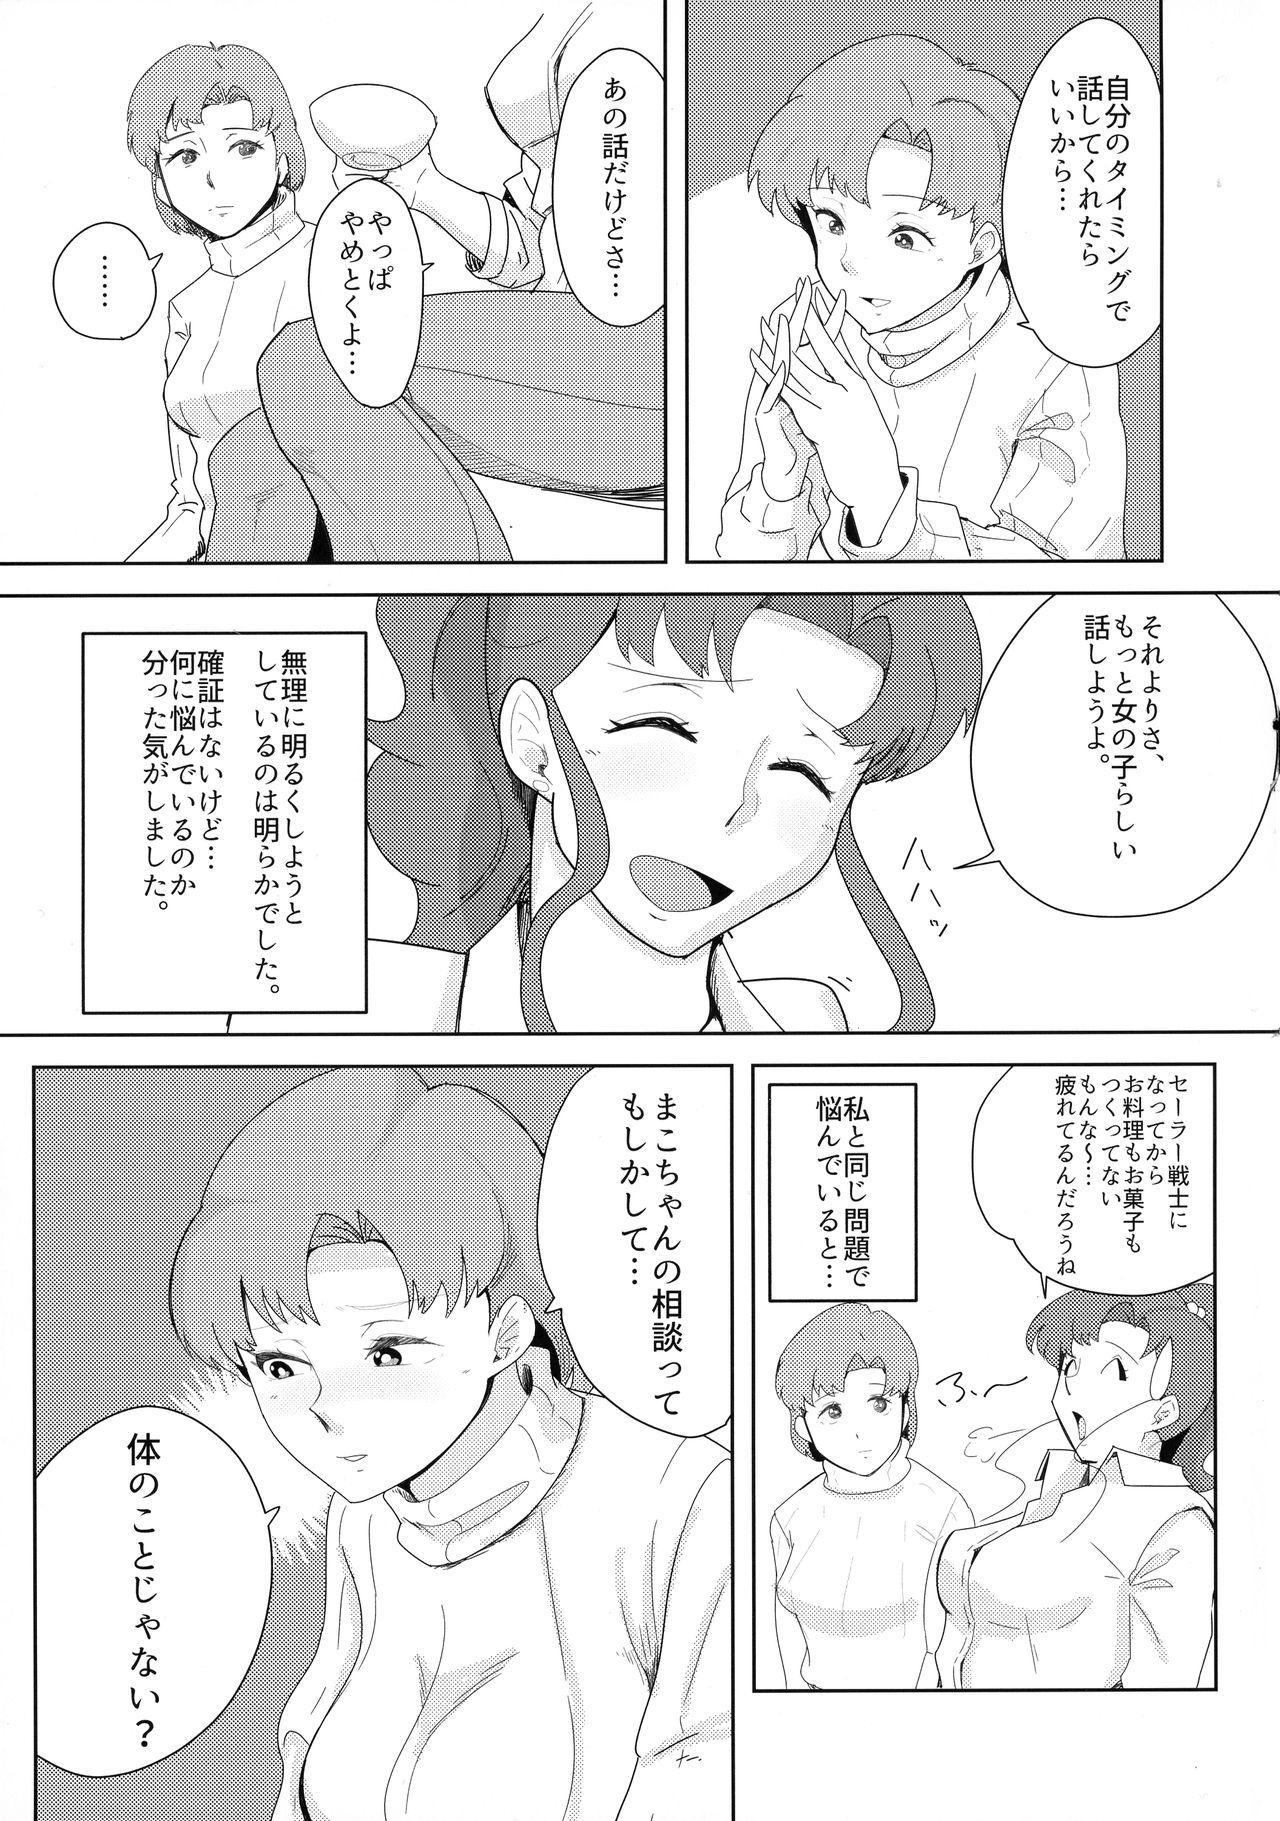 Moon Dick Princess 8